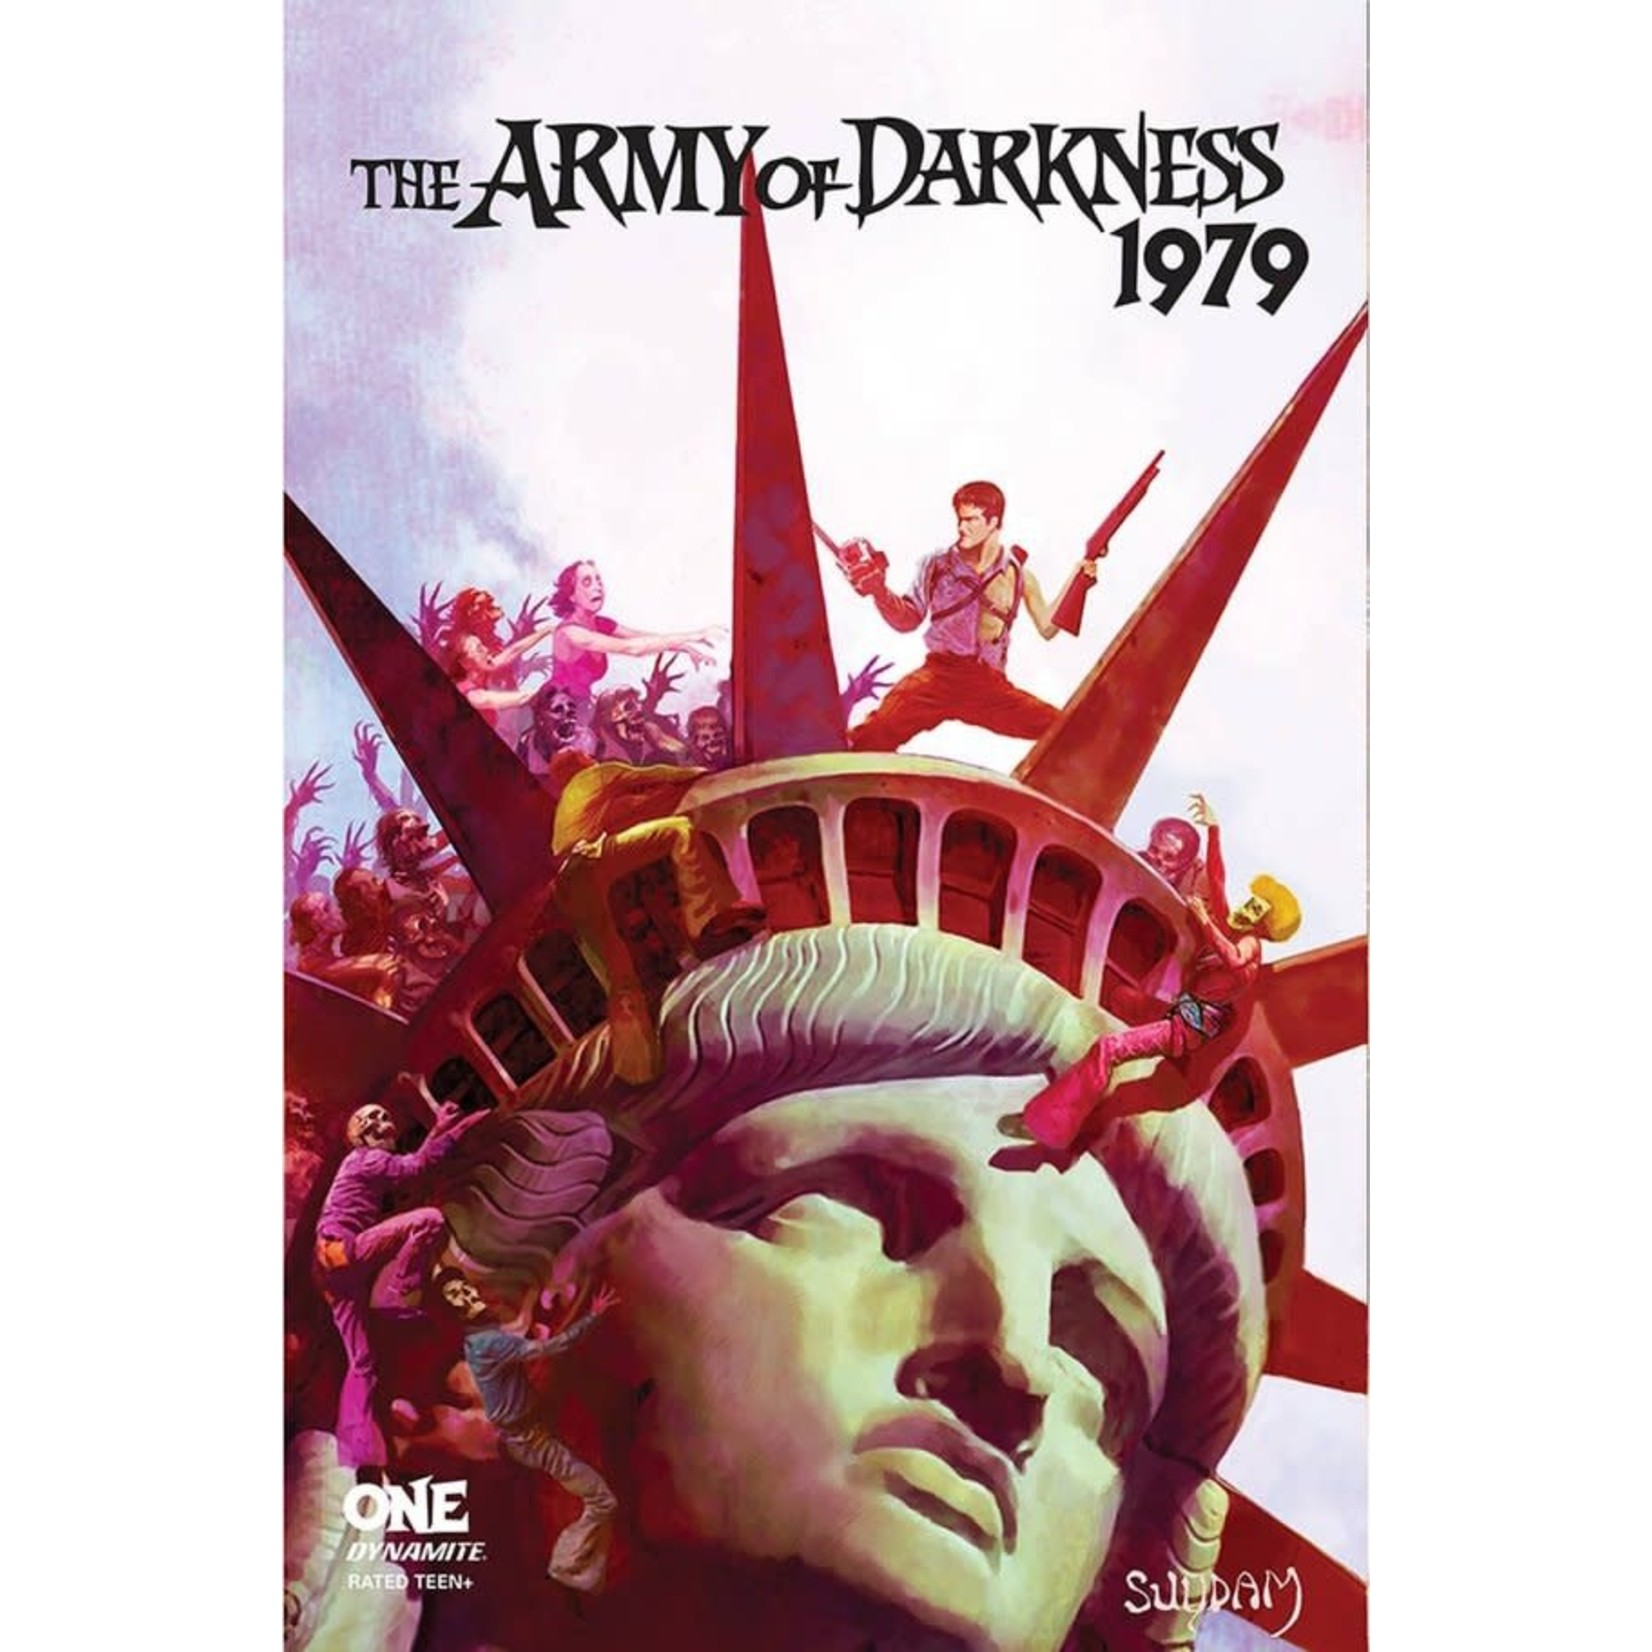 Dynamite Army of Darkness 1979 #1 Cover B Suydam